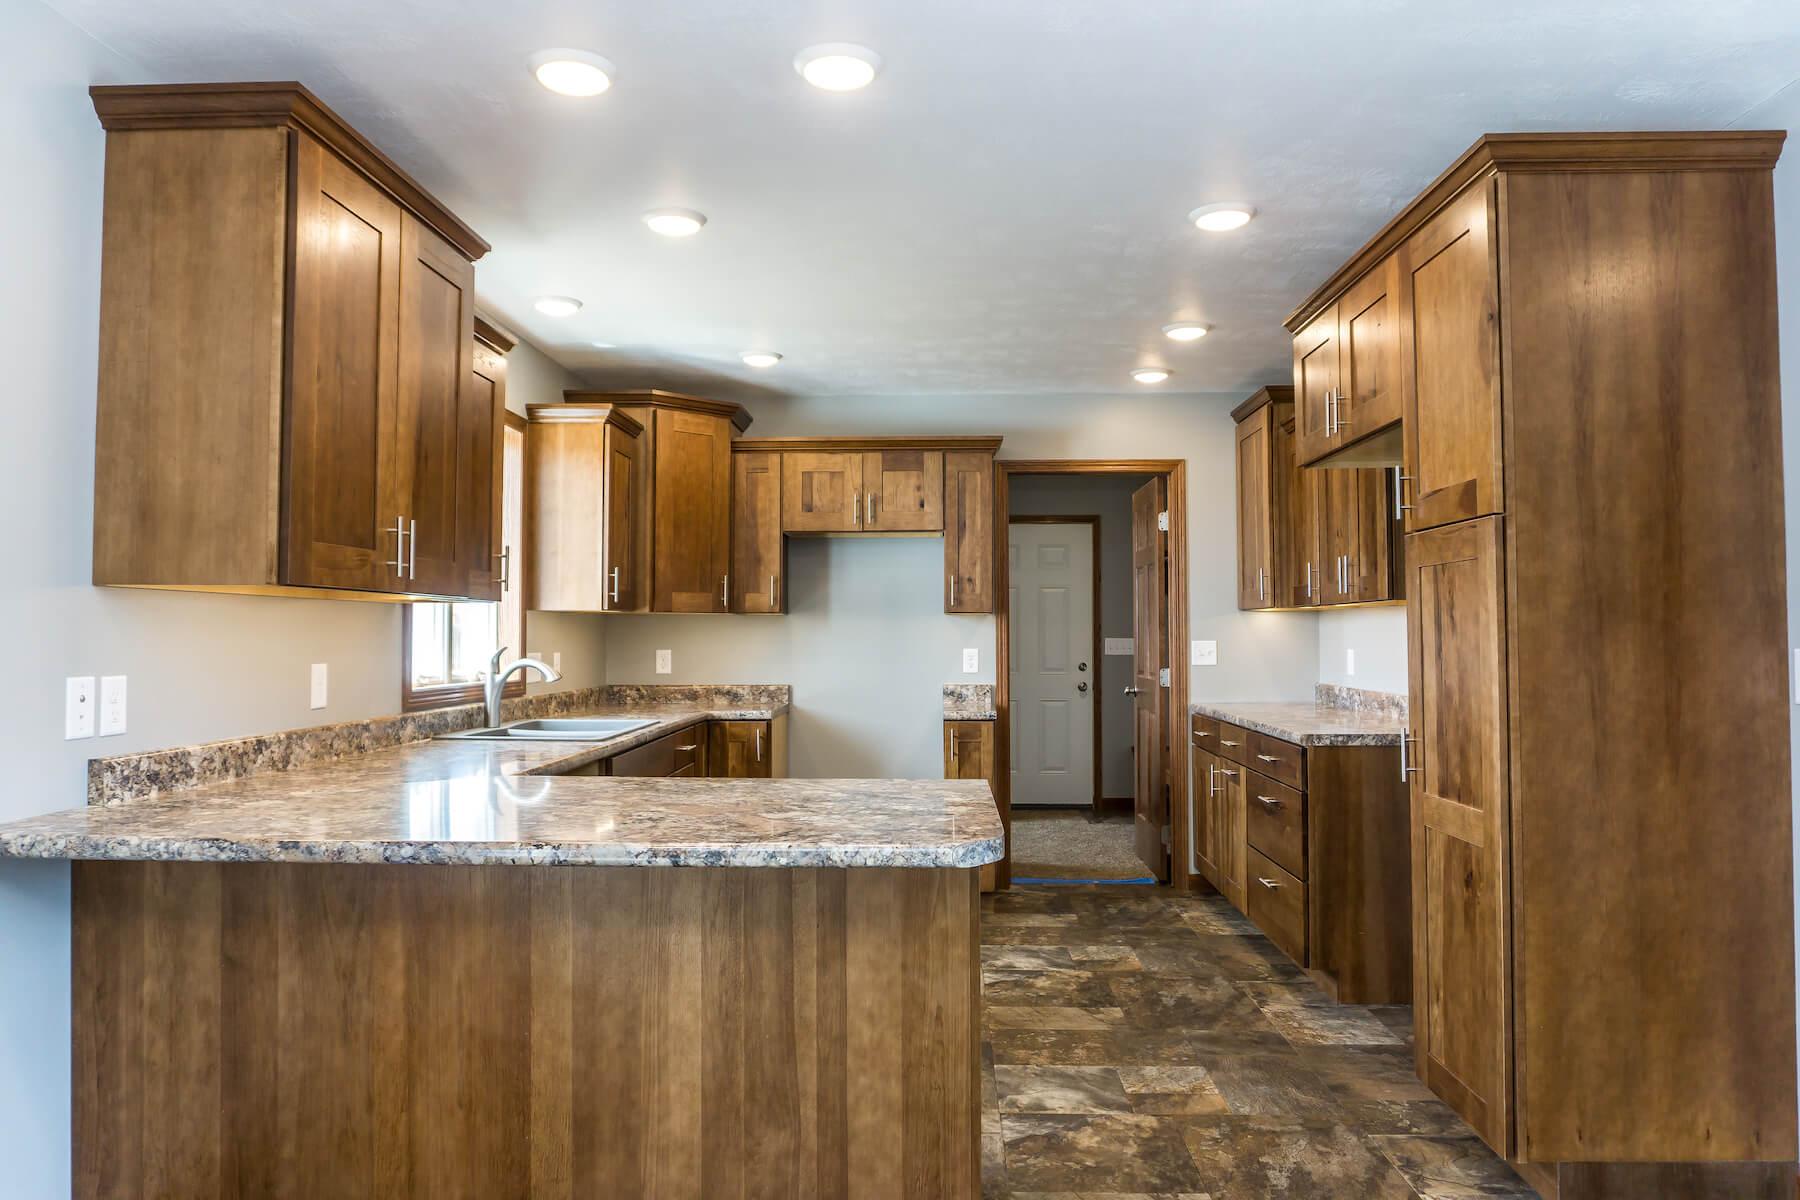 2019-4-12 Kemper Avenue Builders FirstSource Compressed  32.jpg